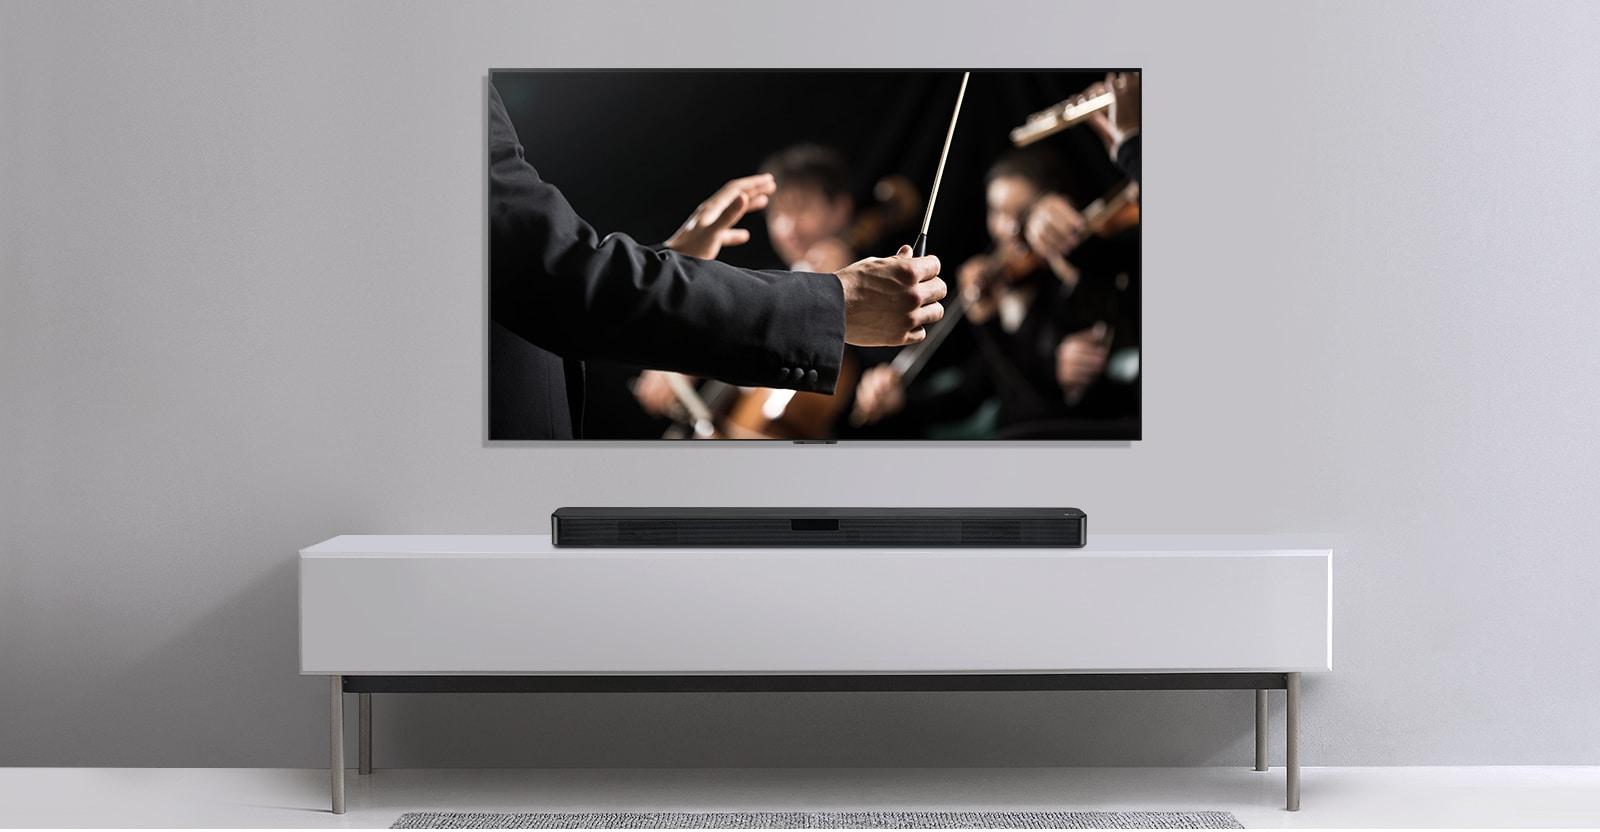 LG Sound Bar SN4 AI Sound Pro